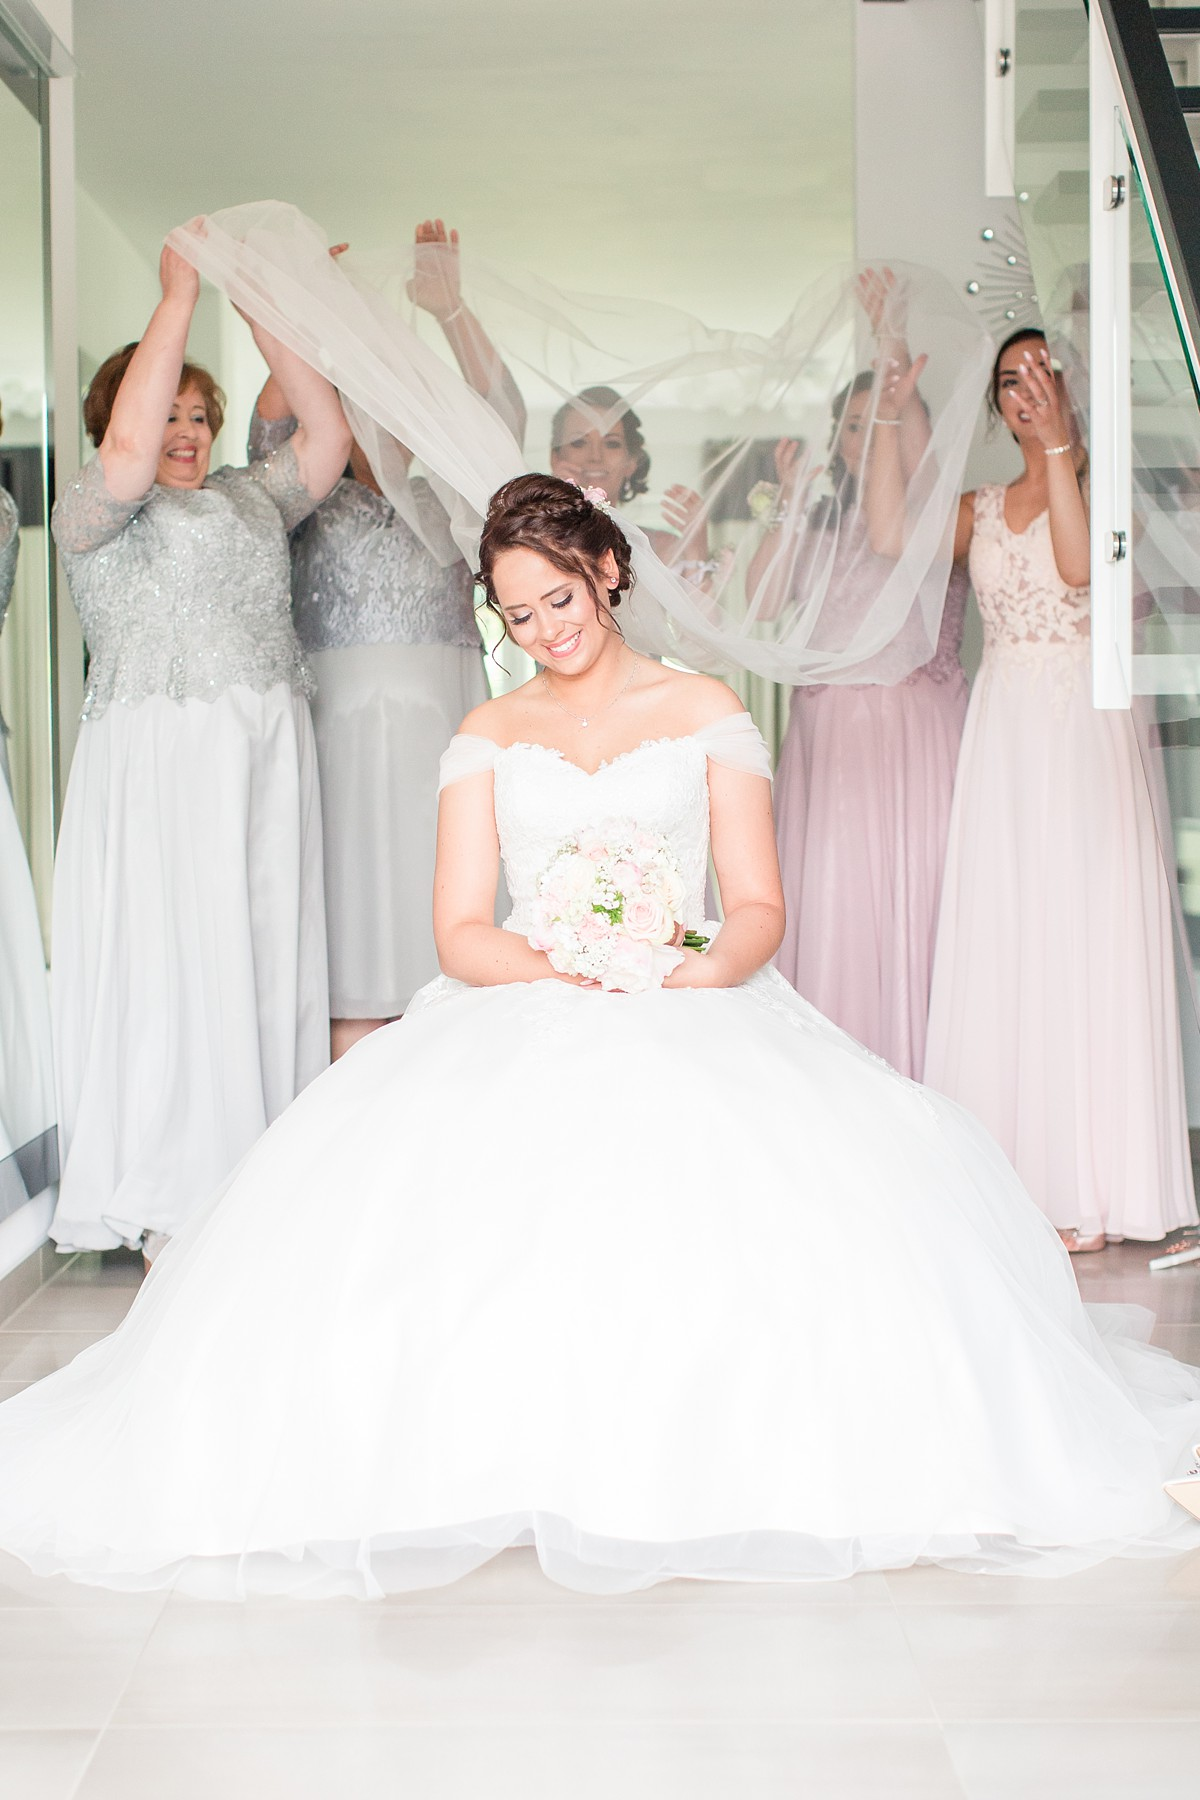 Hochzeitsfotograf-Bünde-Hücker-Moor-Fotograf-Moor-Ranch_0126